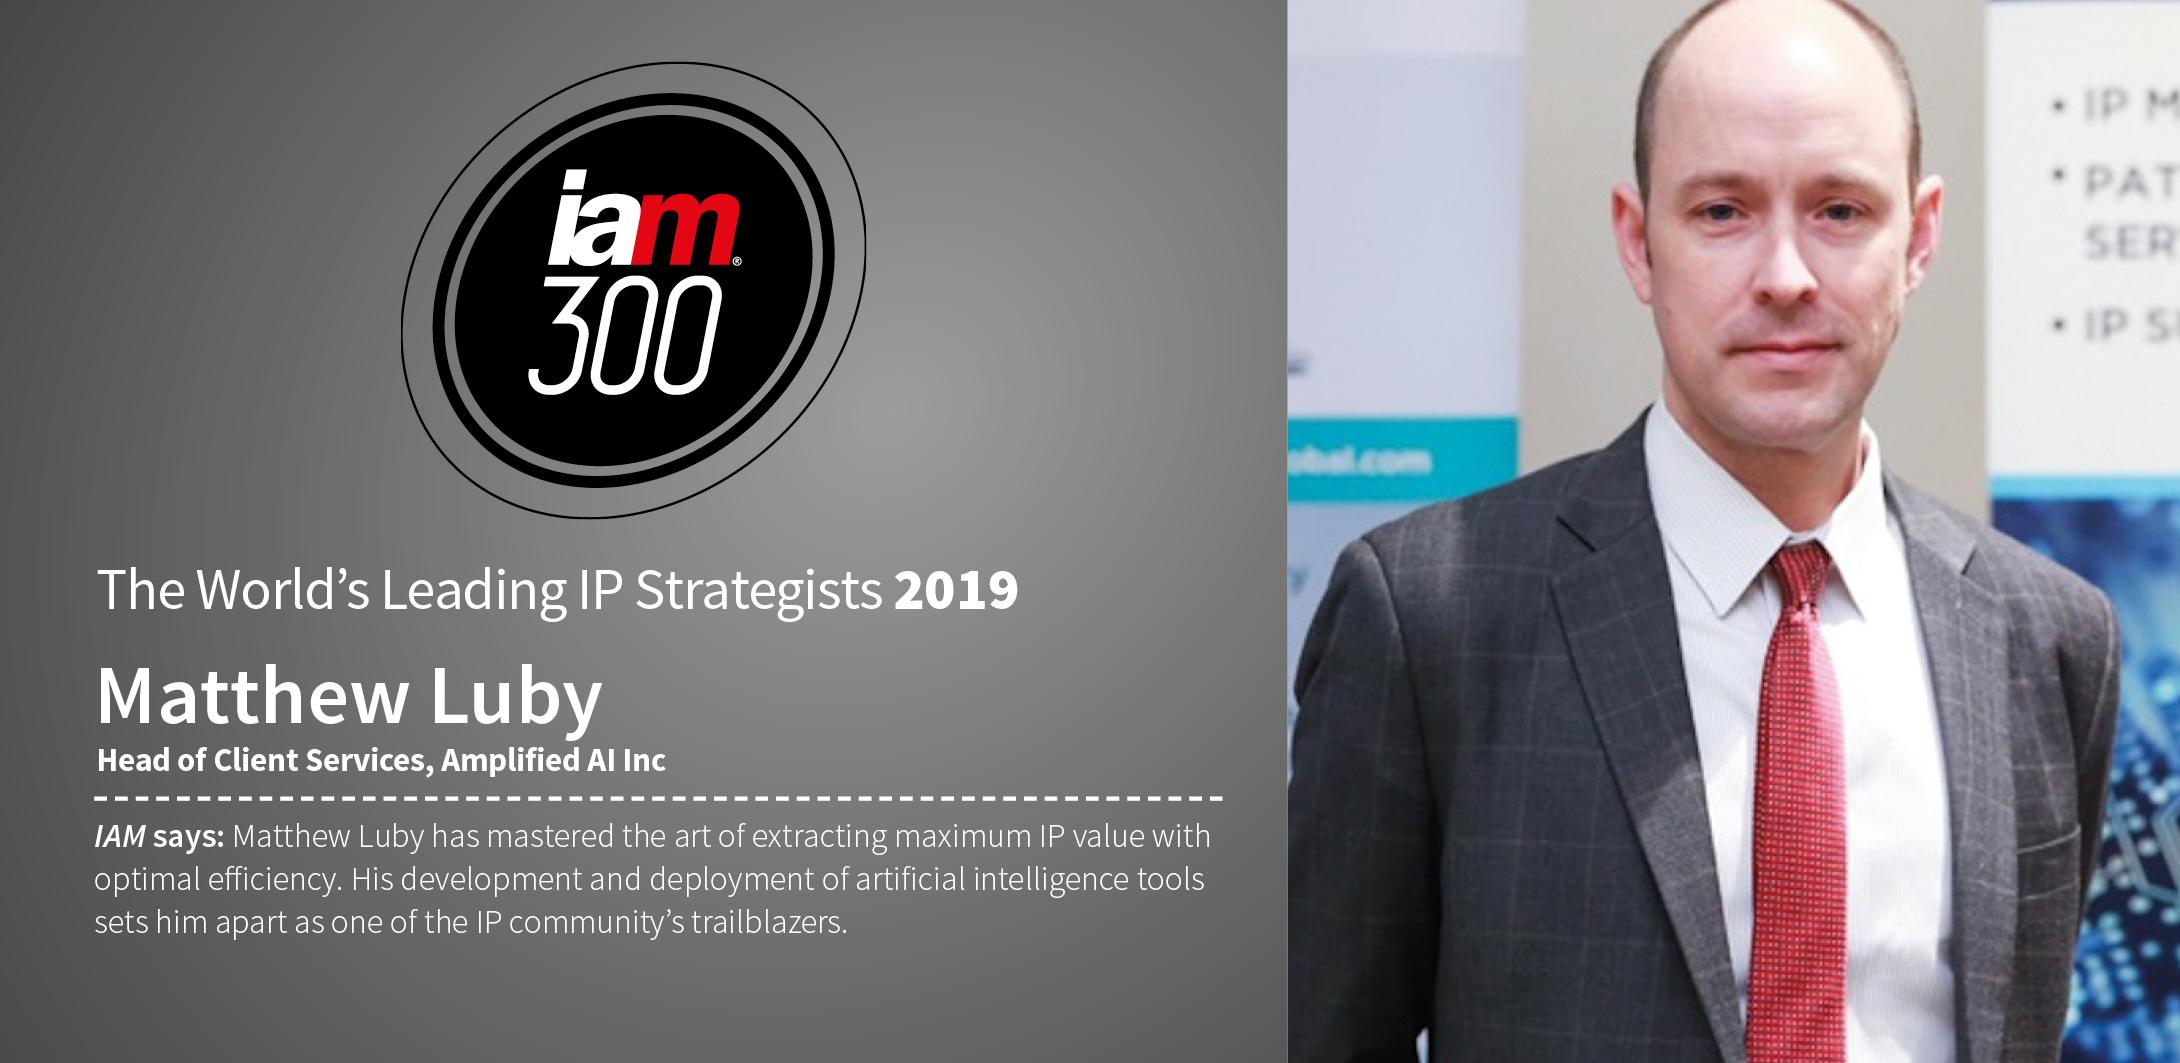 STO-5479 IAM Strategy 300 social media cards-94-Matthew Luby.jpg